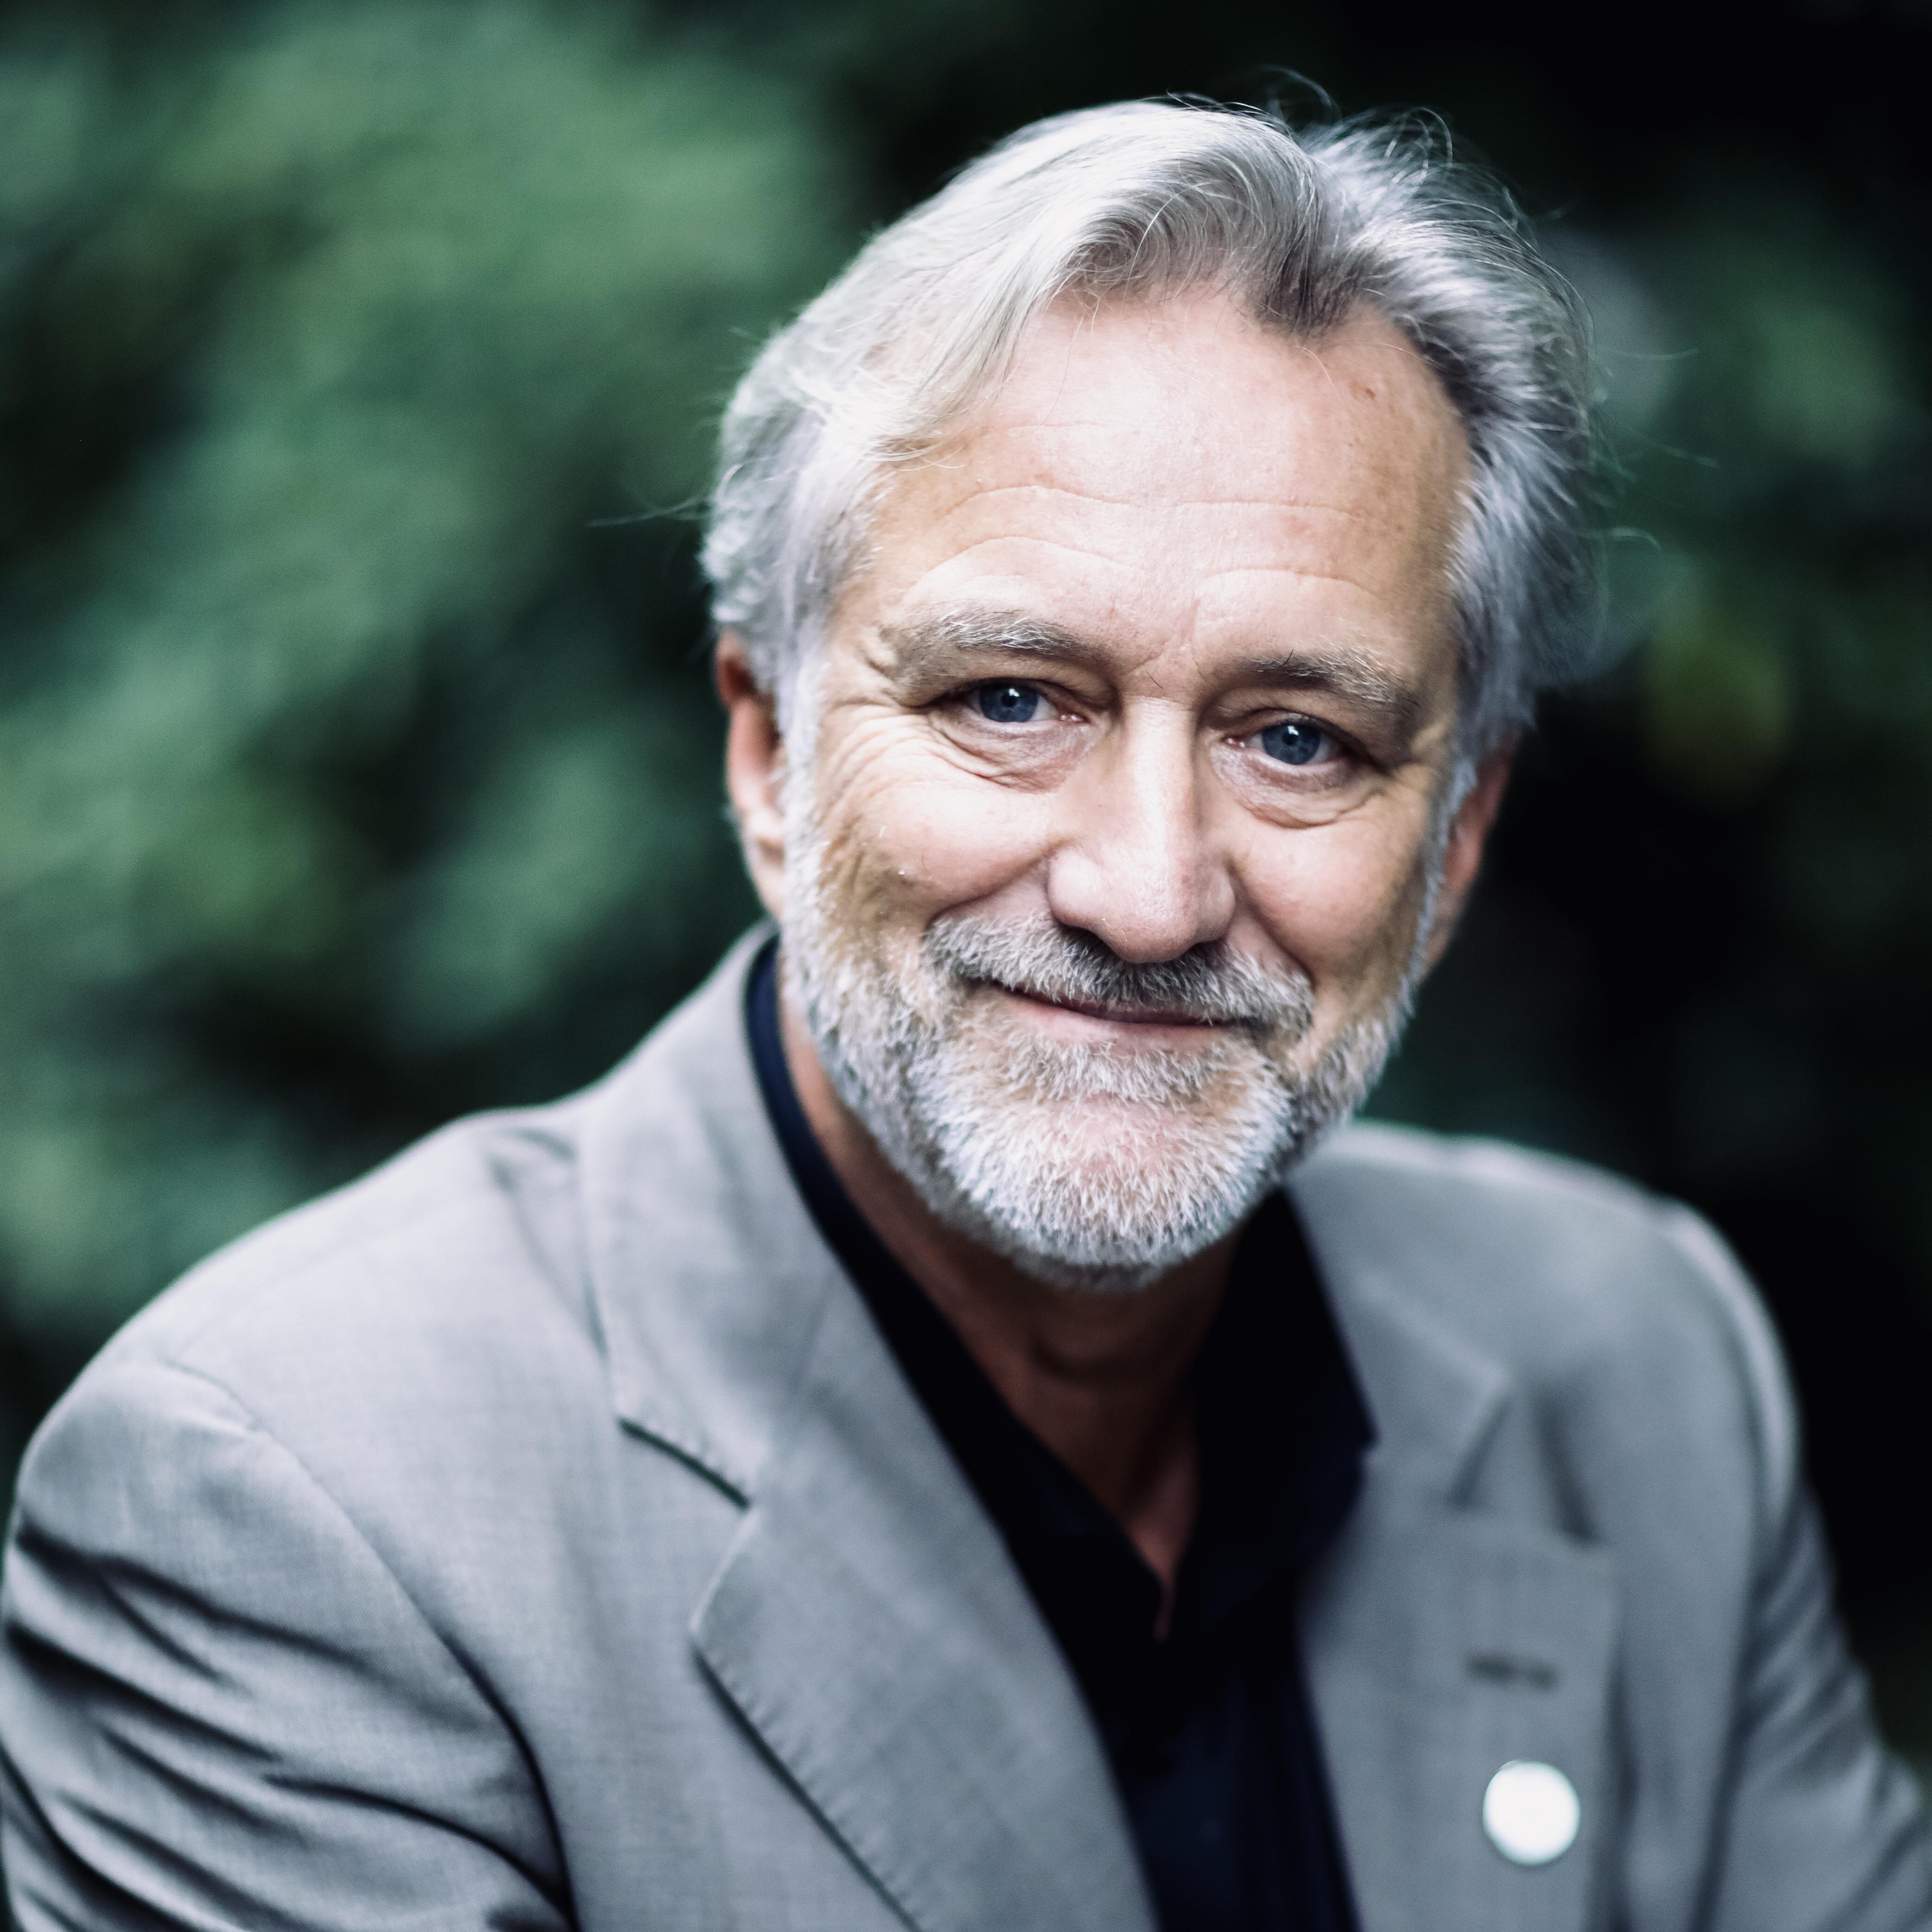 Jeanick Brisswalter